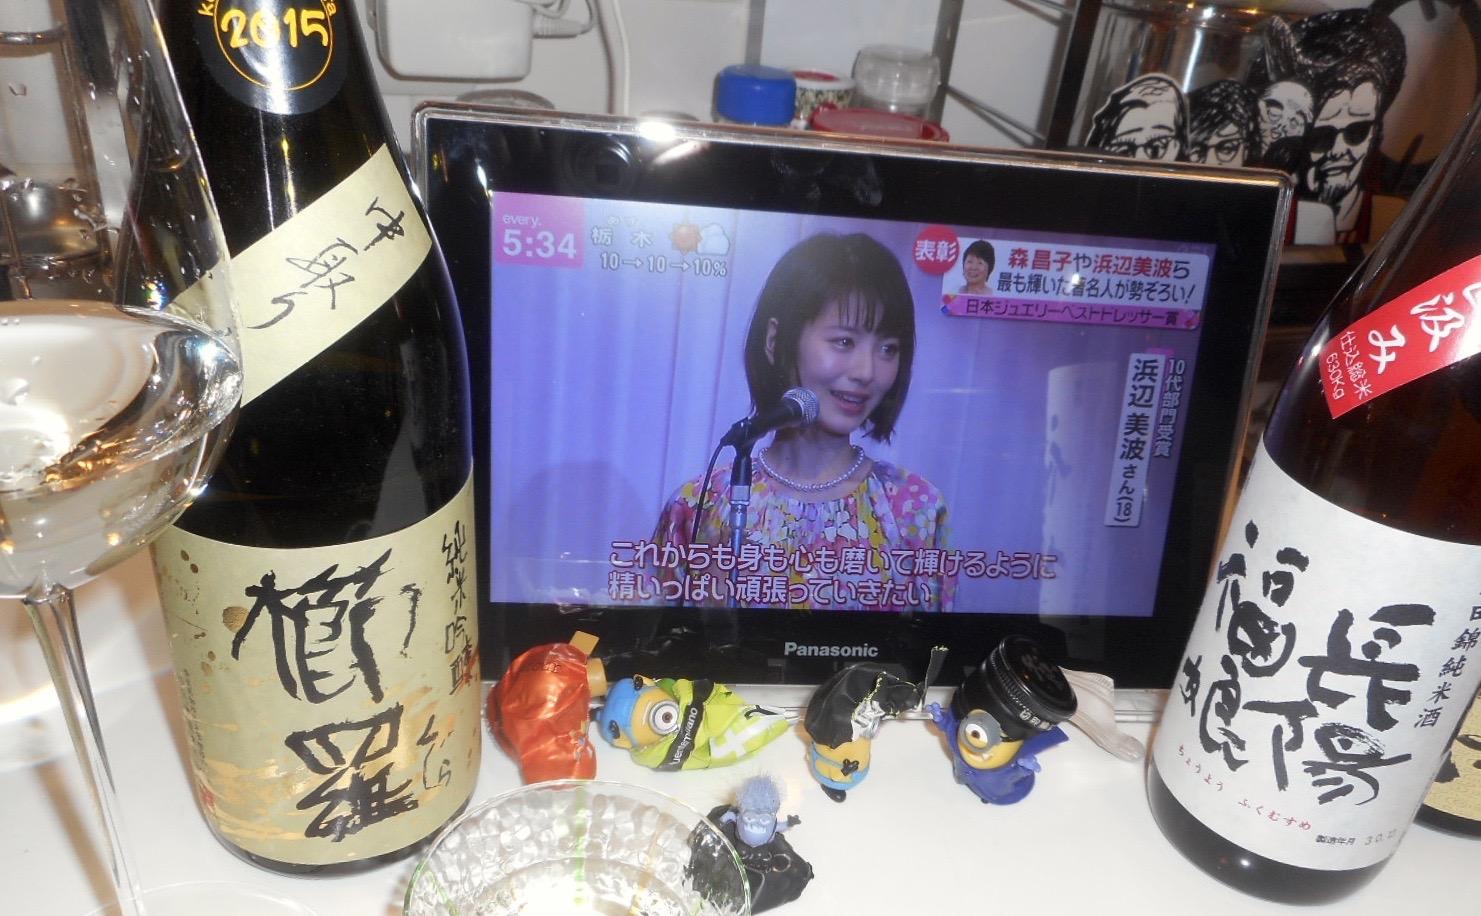 kujira2015_3_5.jpg